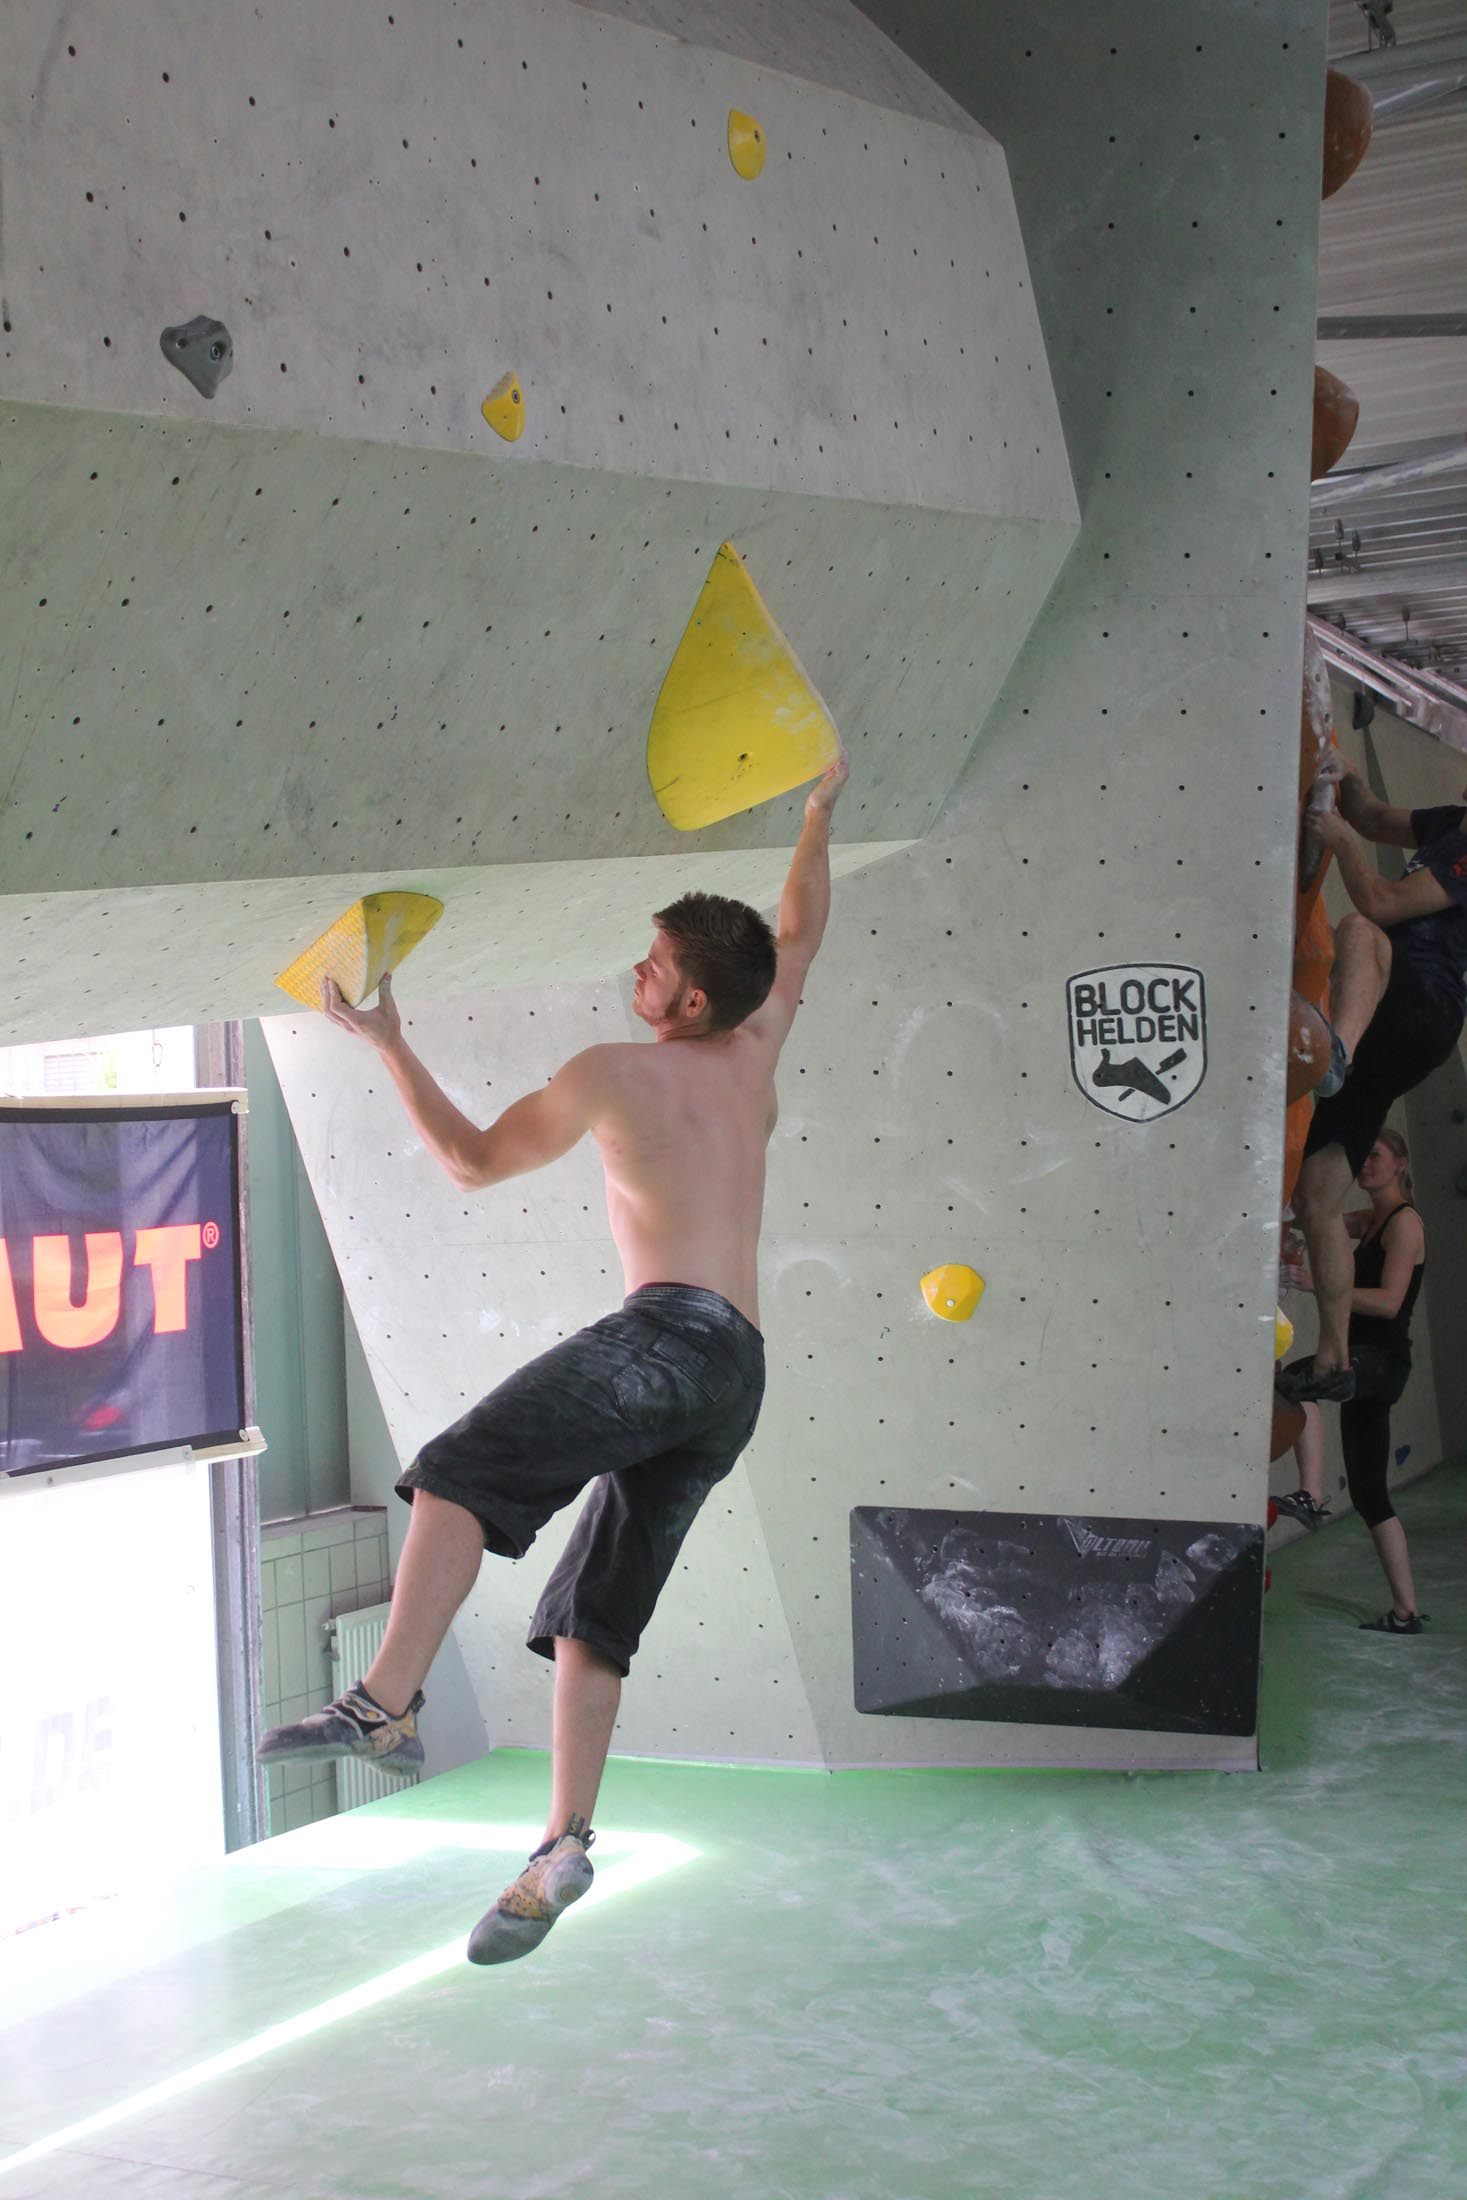 Quali, internationaler bouldercup Frankenjura 2016, BLOCKHELDEN Erlangen, Mammut, Bergfreunde.de, Boulderwettkampf07092016182